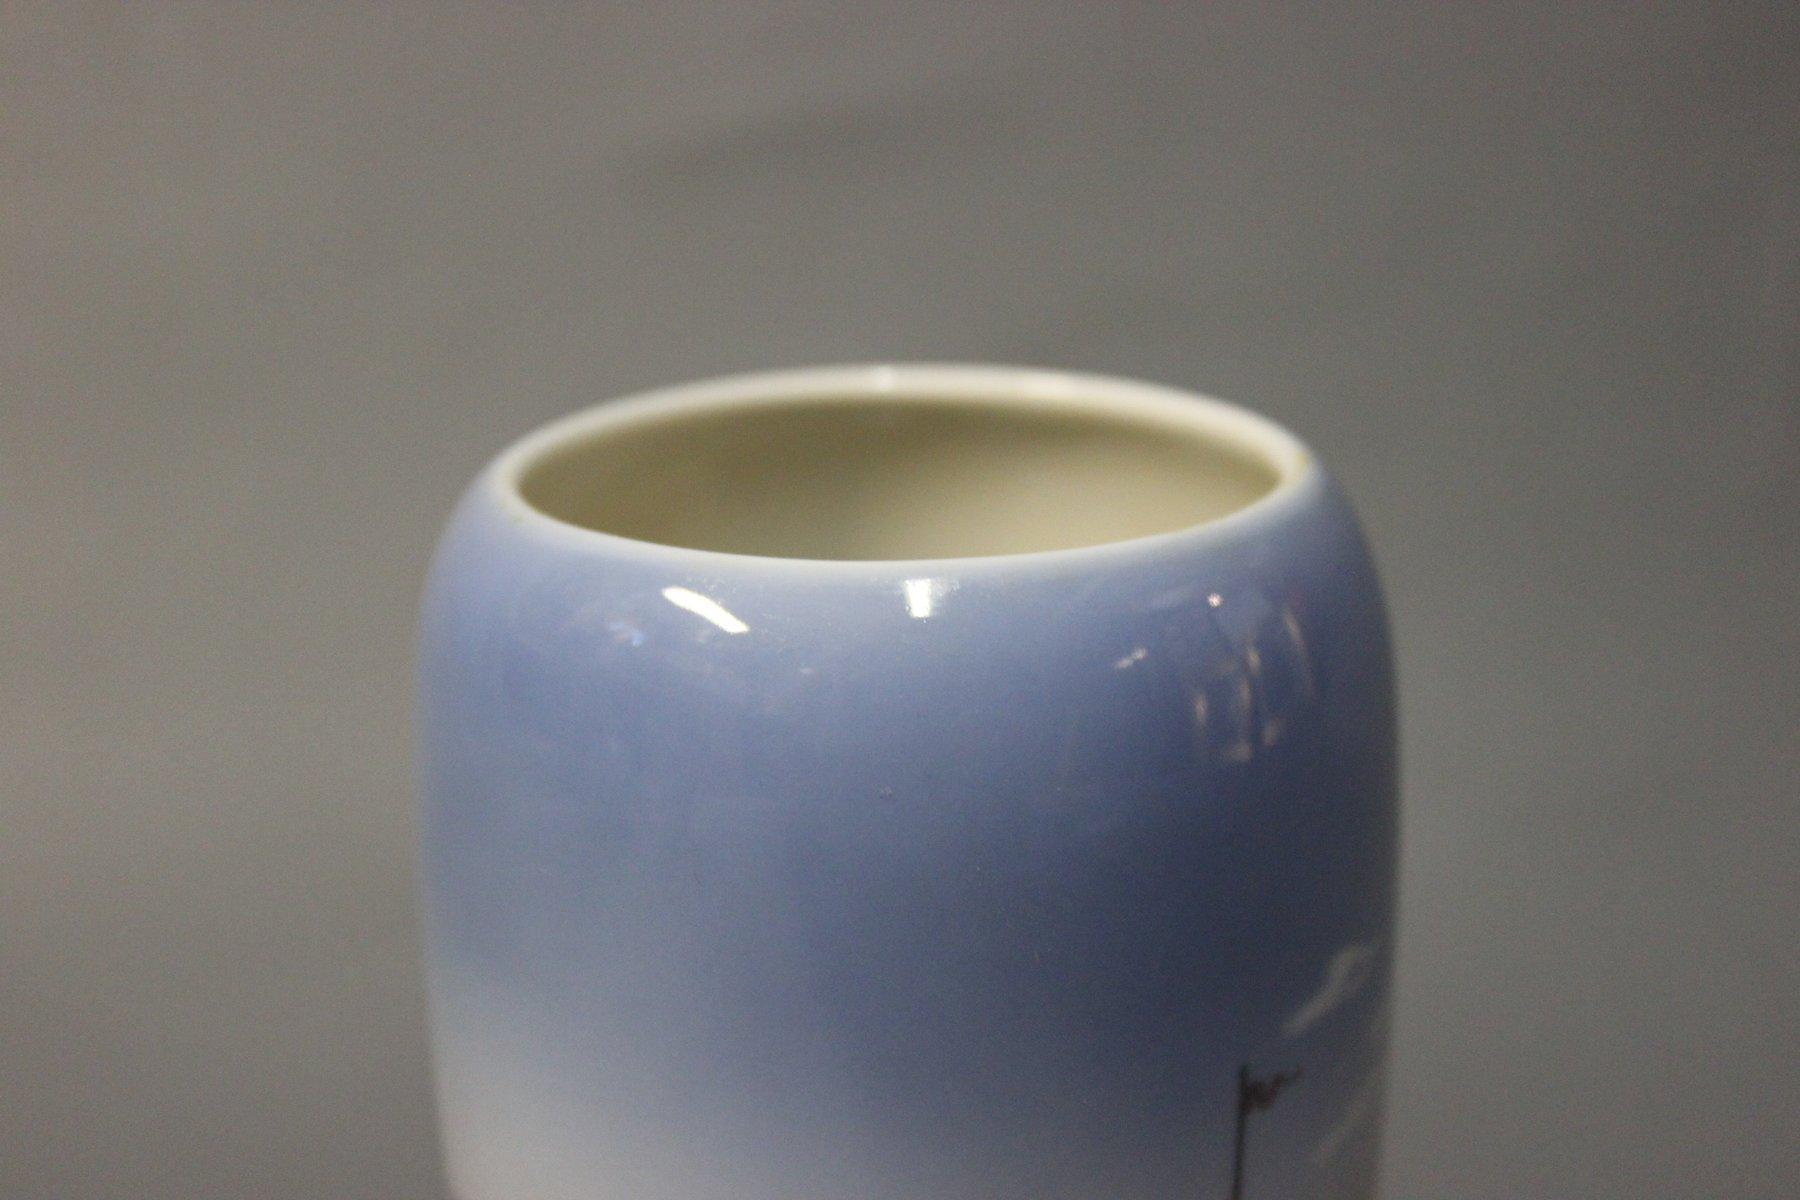 Danish harbor motif vase from royal copenhagen 1980s for sale at price 33800 regular price 36000 reviewsmspy